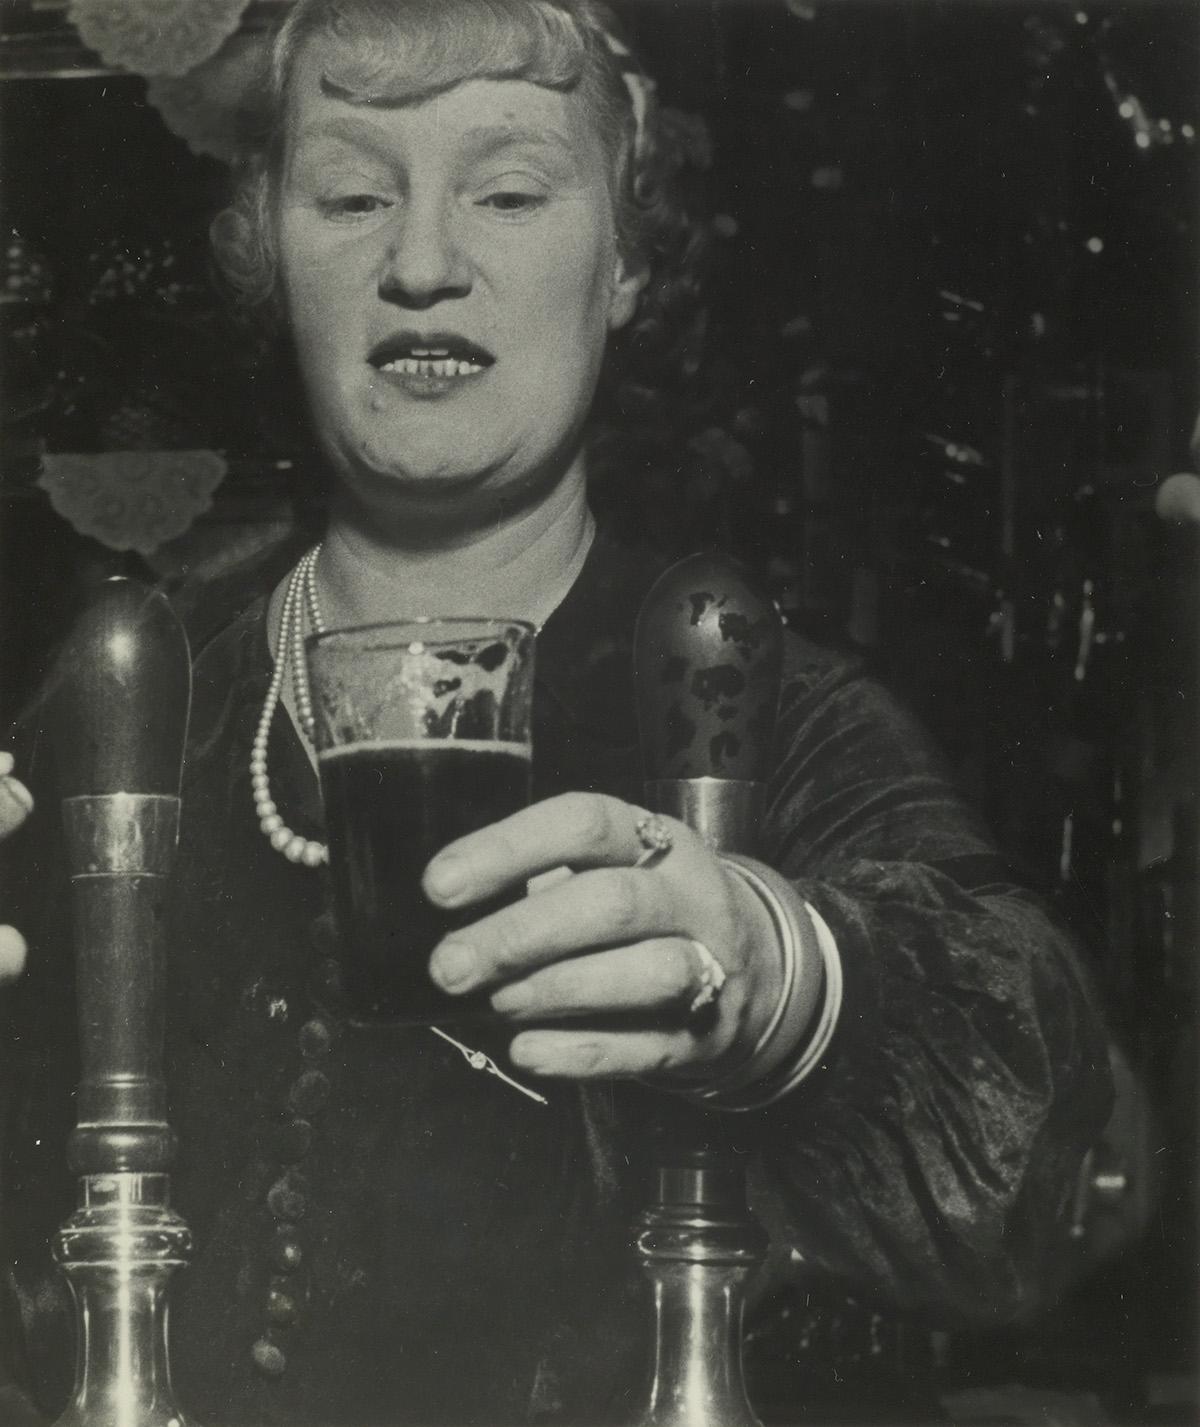 BILL BRANDT (1904-1983) Barmaid at the Crooket Billet, Tower Hill.